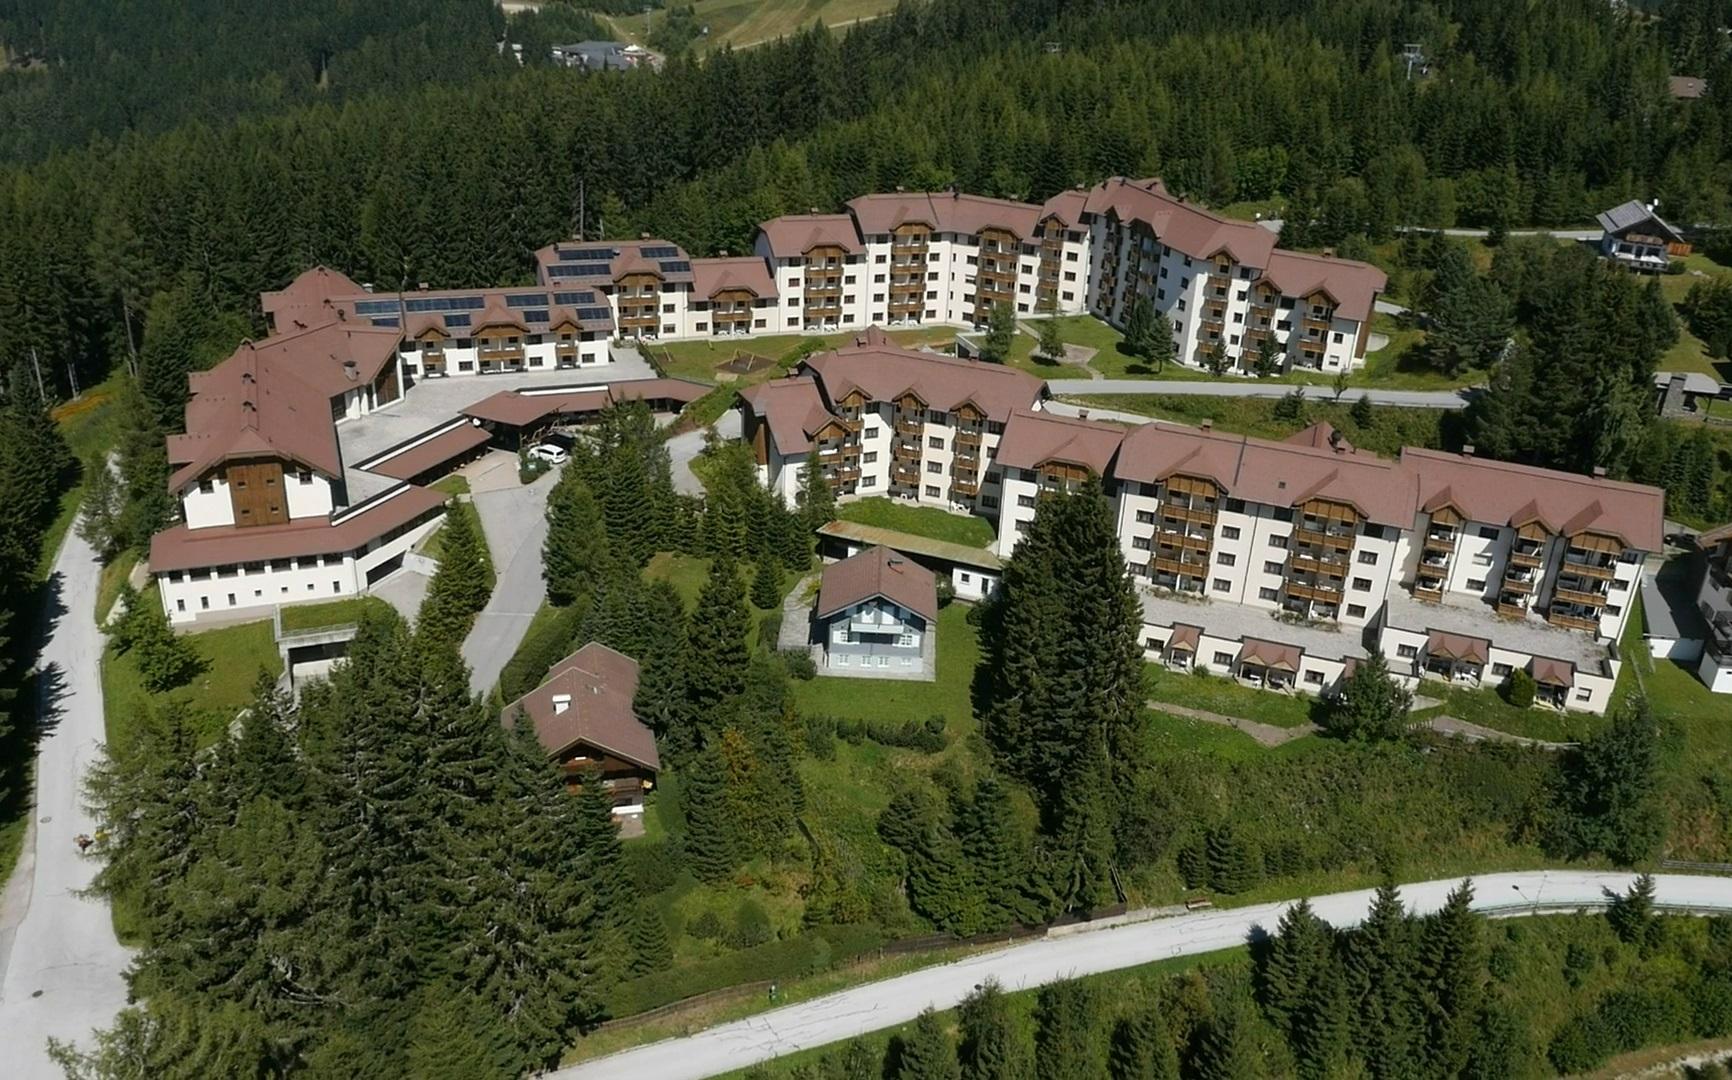 Almresort gerlitzen kanzelh he hotel per bambini in montagna a treffen its4kids - Hotel in montagna con piscina ...